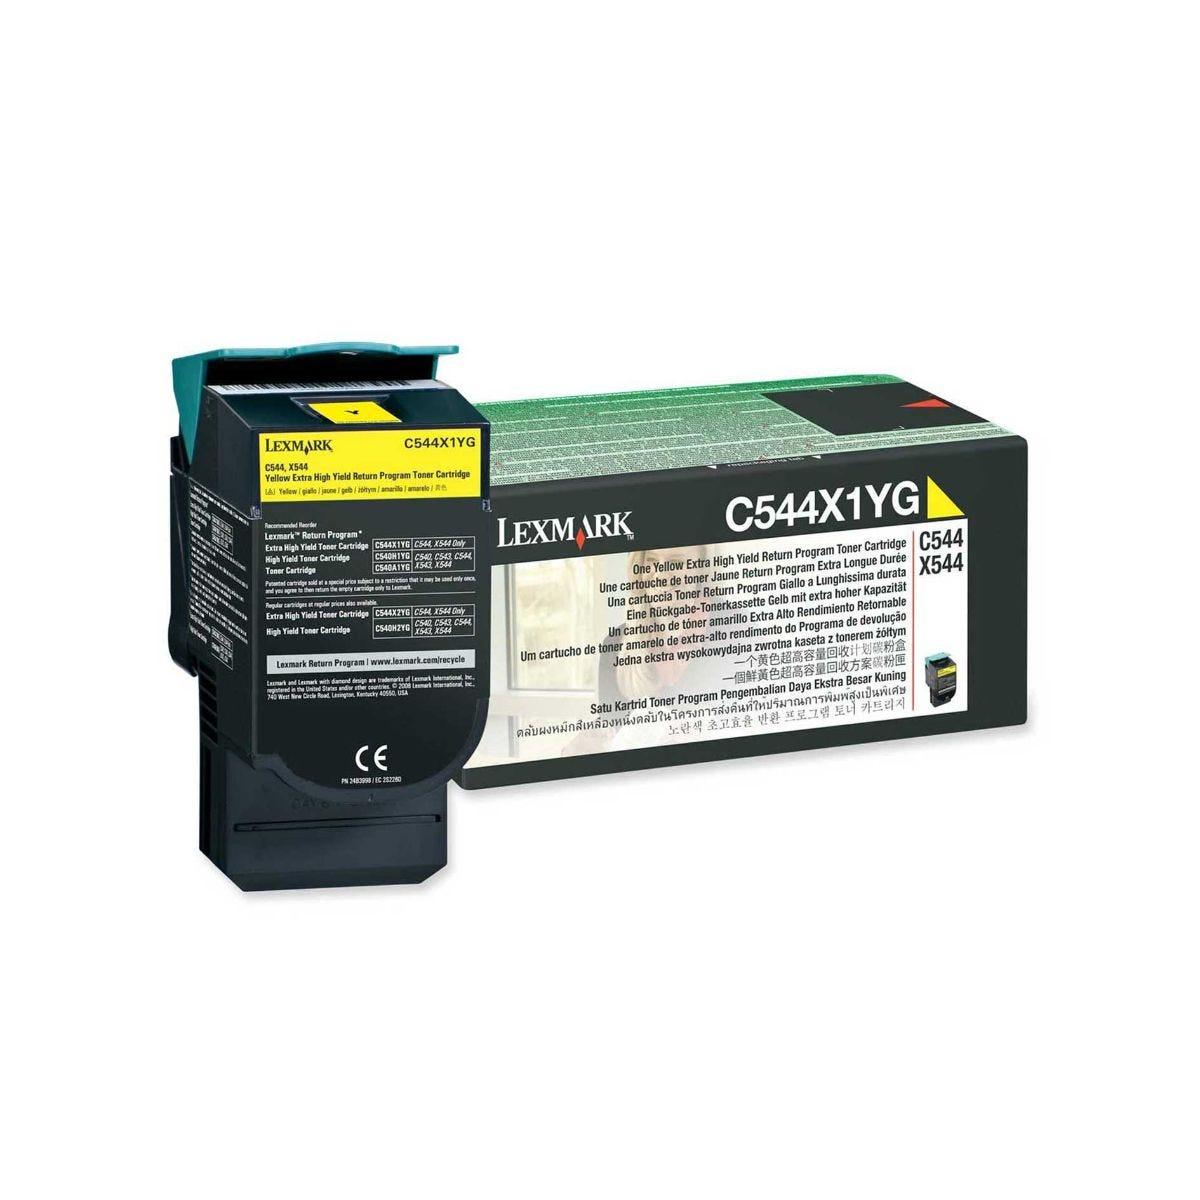 Lexmark C544X1YG Toner Cartridge Extra High Yield, Yellow.